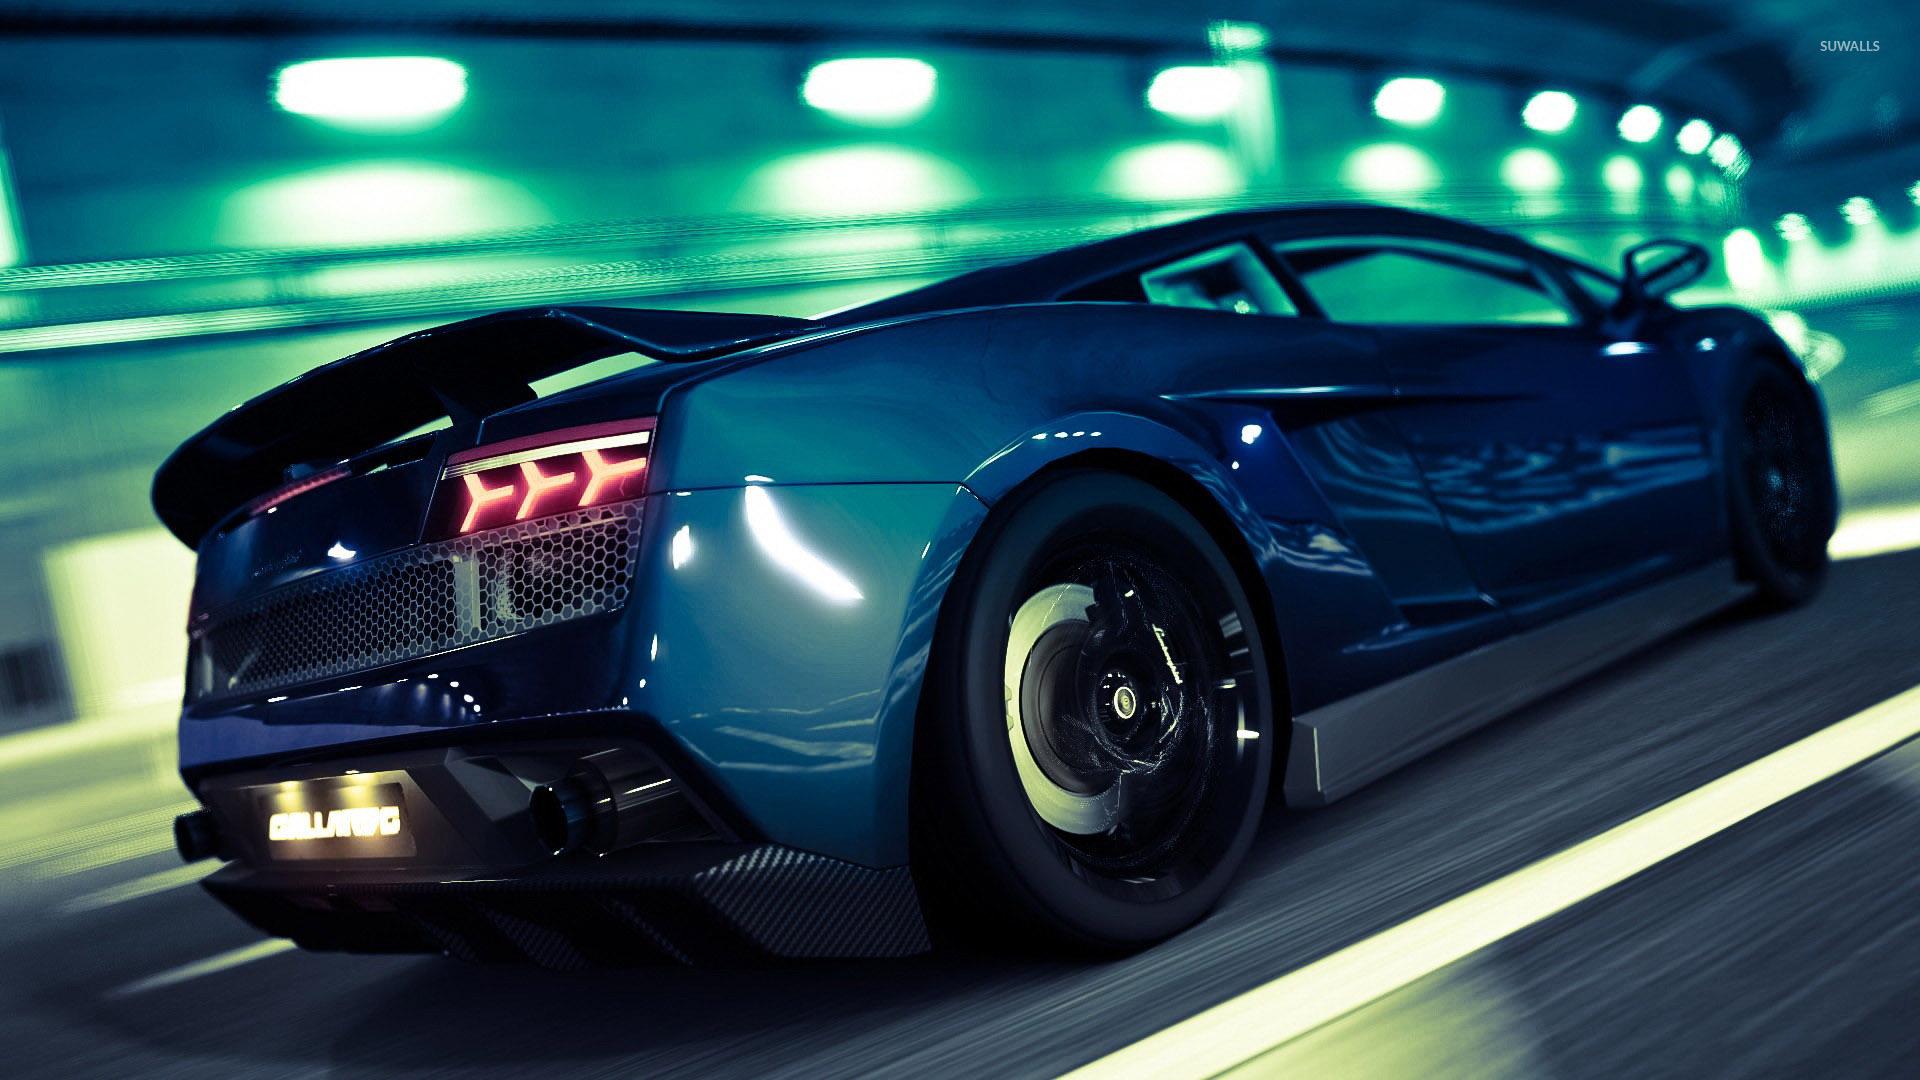 lamborghini gallardo gran turismo 5 wallpaper 1920x1080 jpg - Lamborghini Gallardo Superleggera Wallpaper